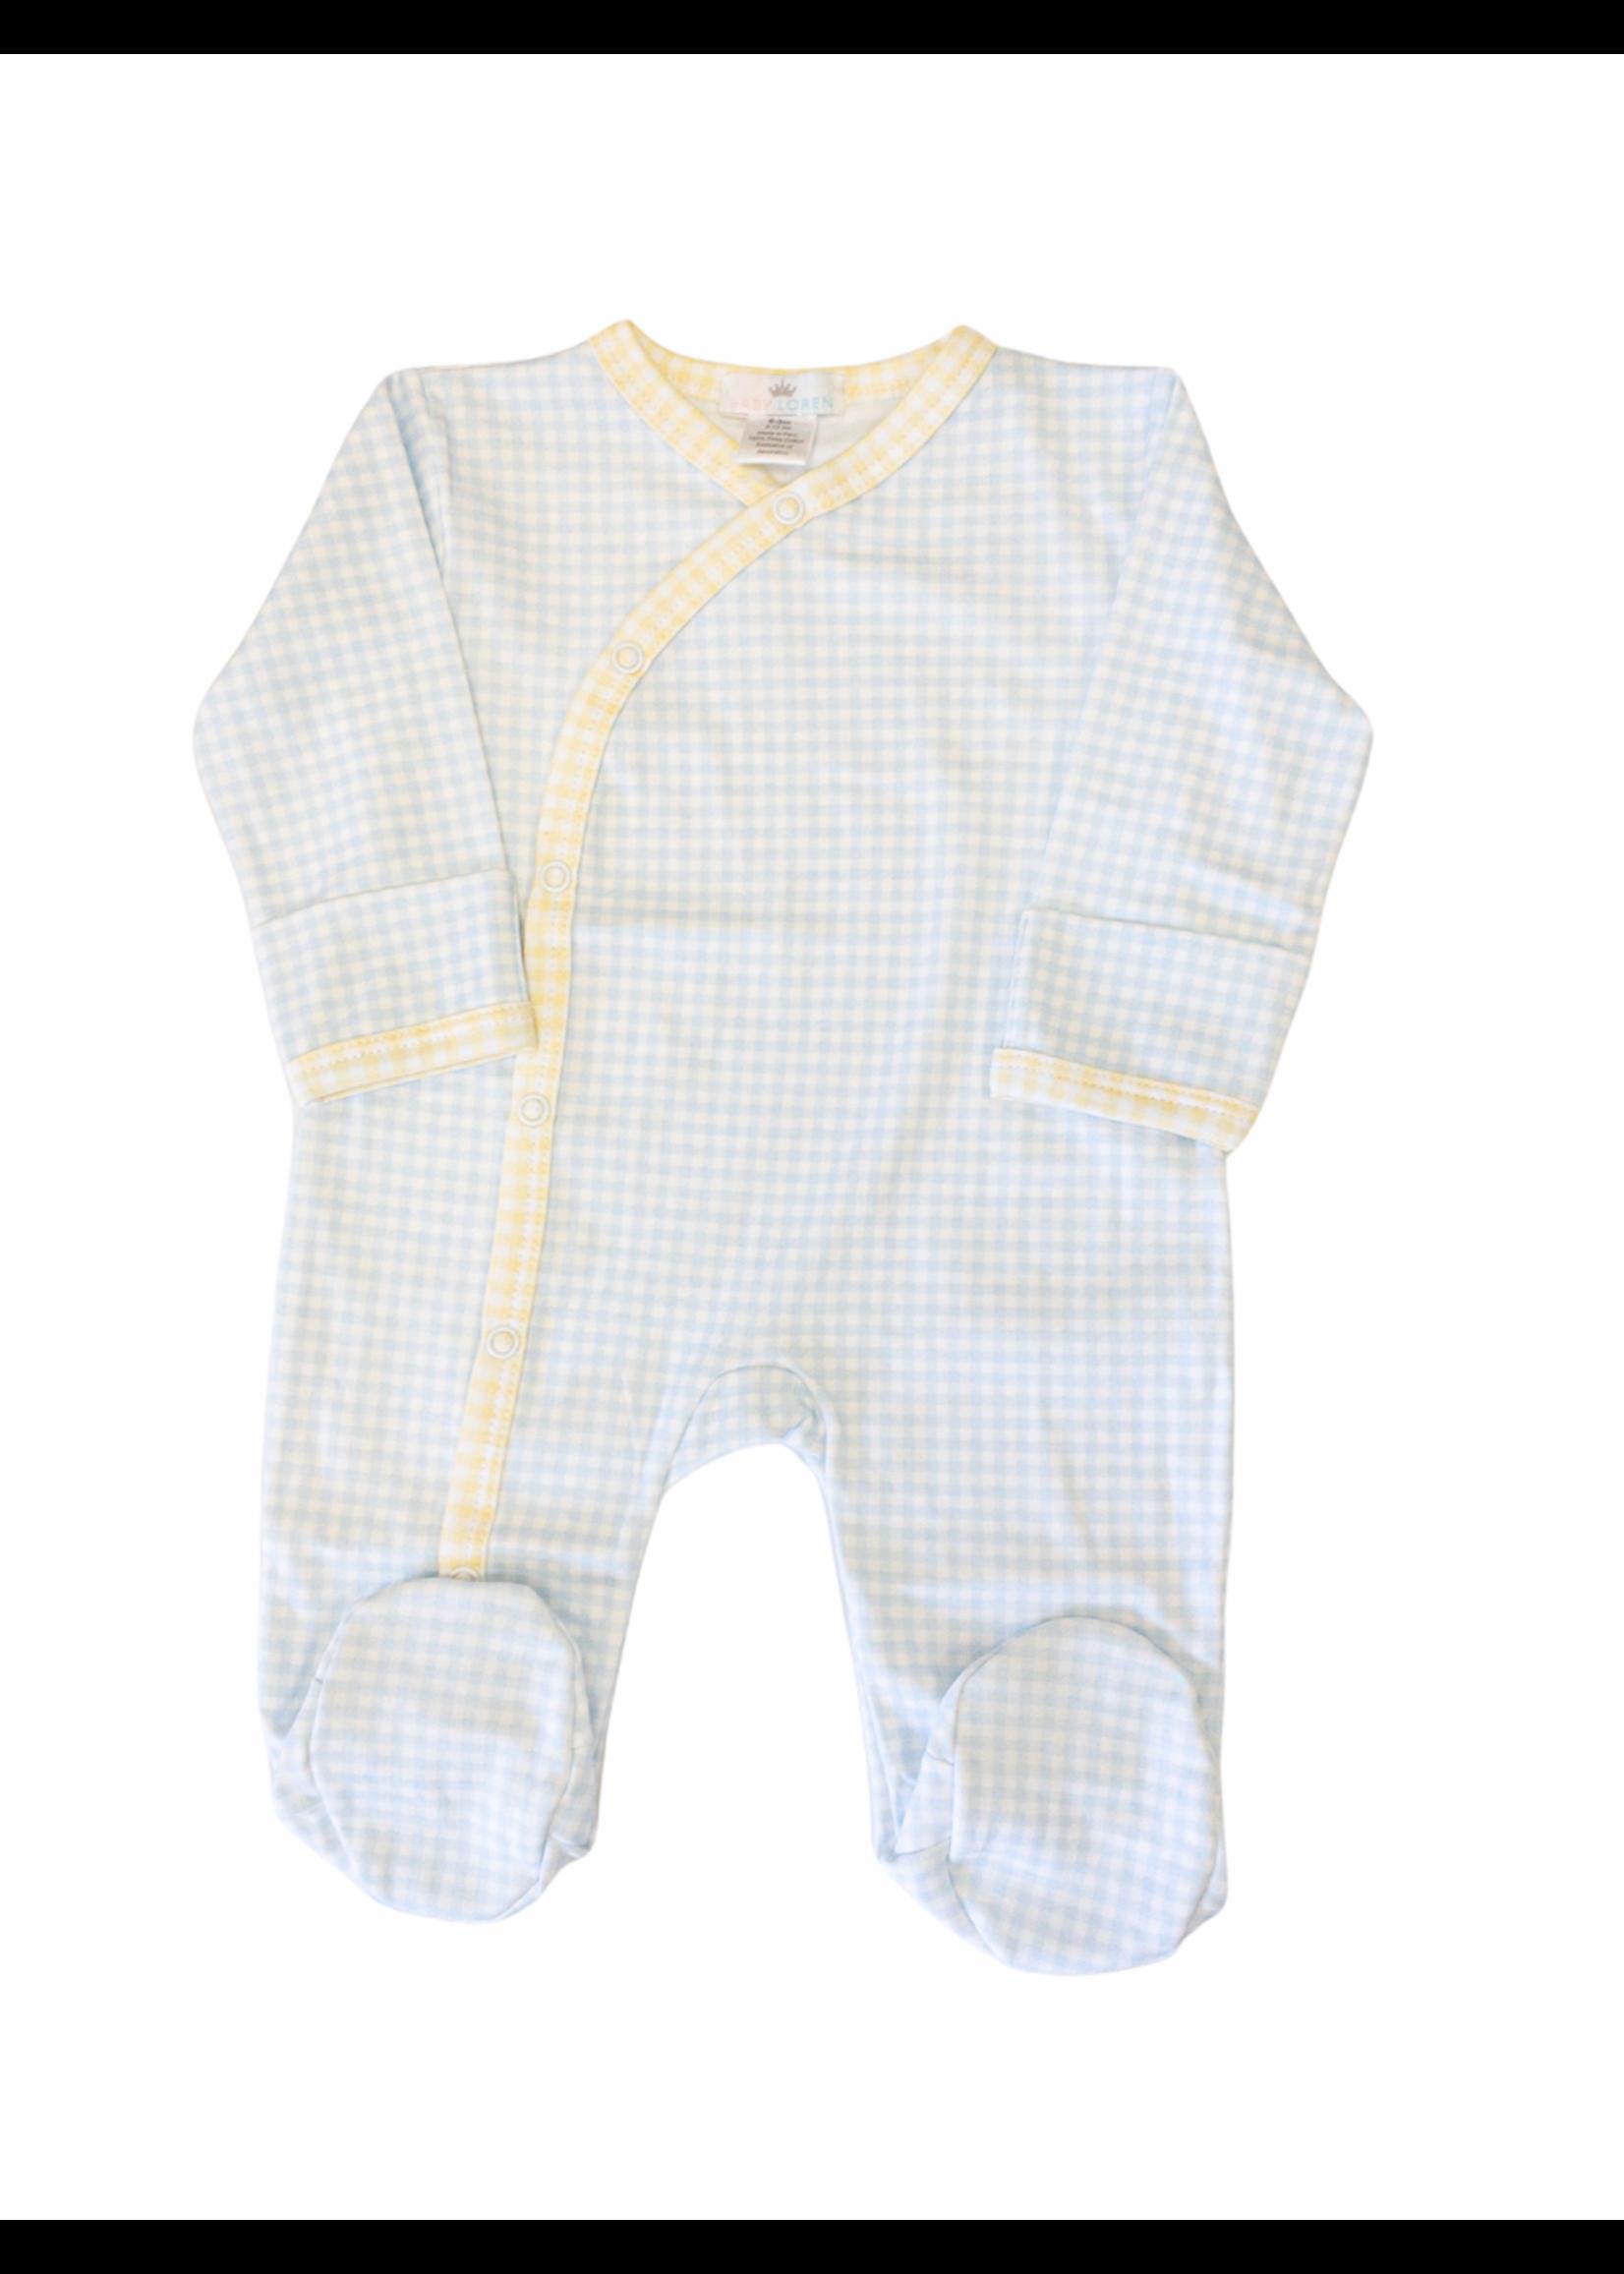 Baby Loren Luke Blue/Yellow Gingham Footie